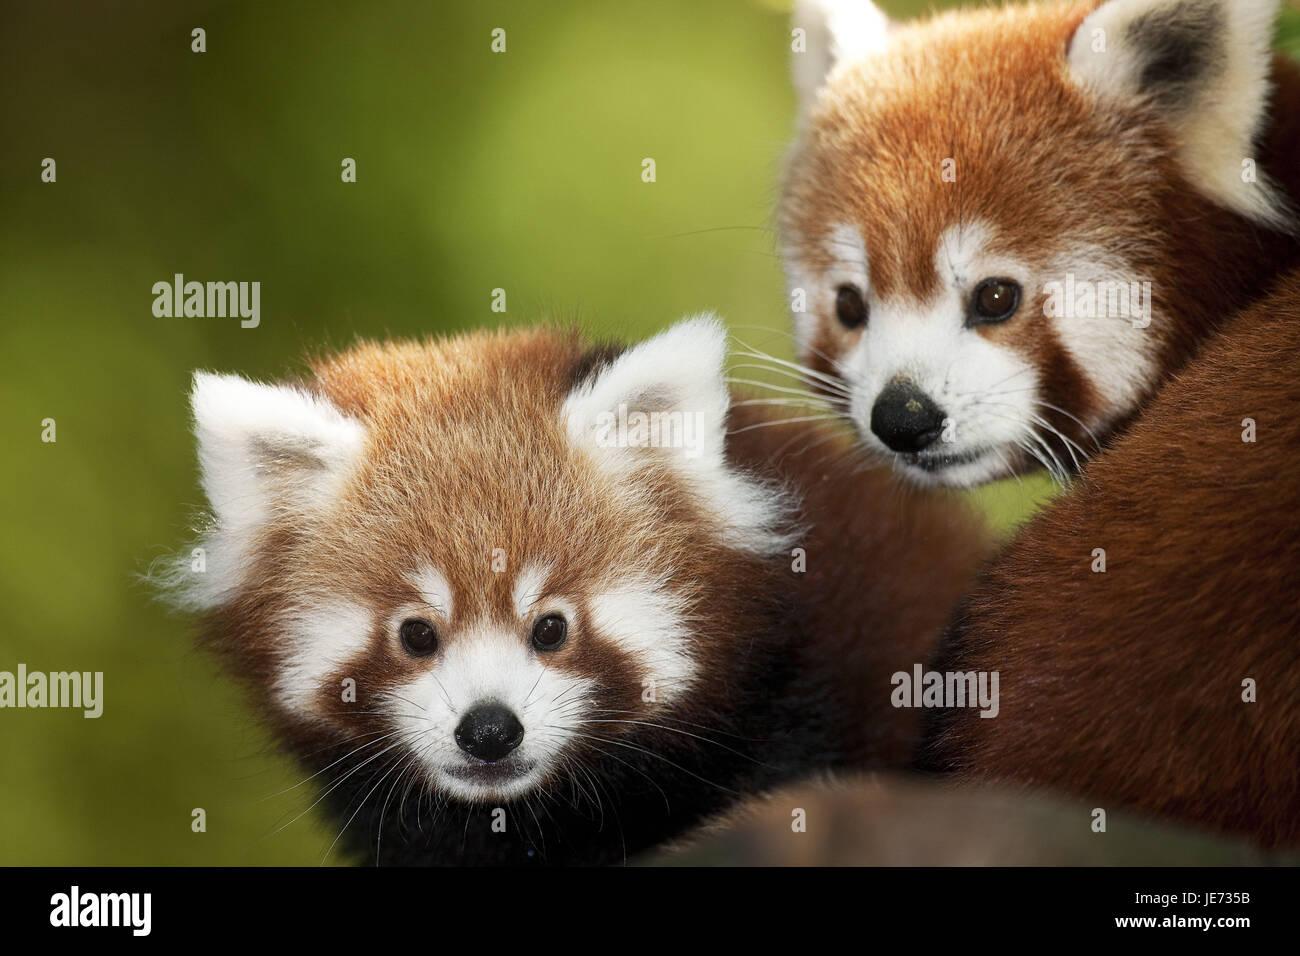 Petit panda Ailurus fulgens, également, le panda rouge, animaux, portrait, Photo Stock